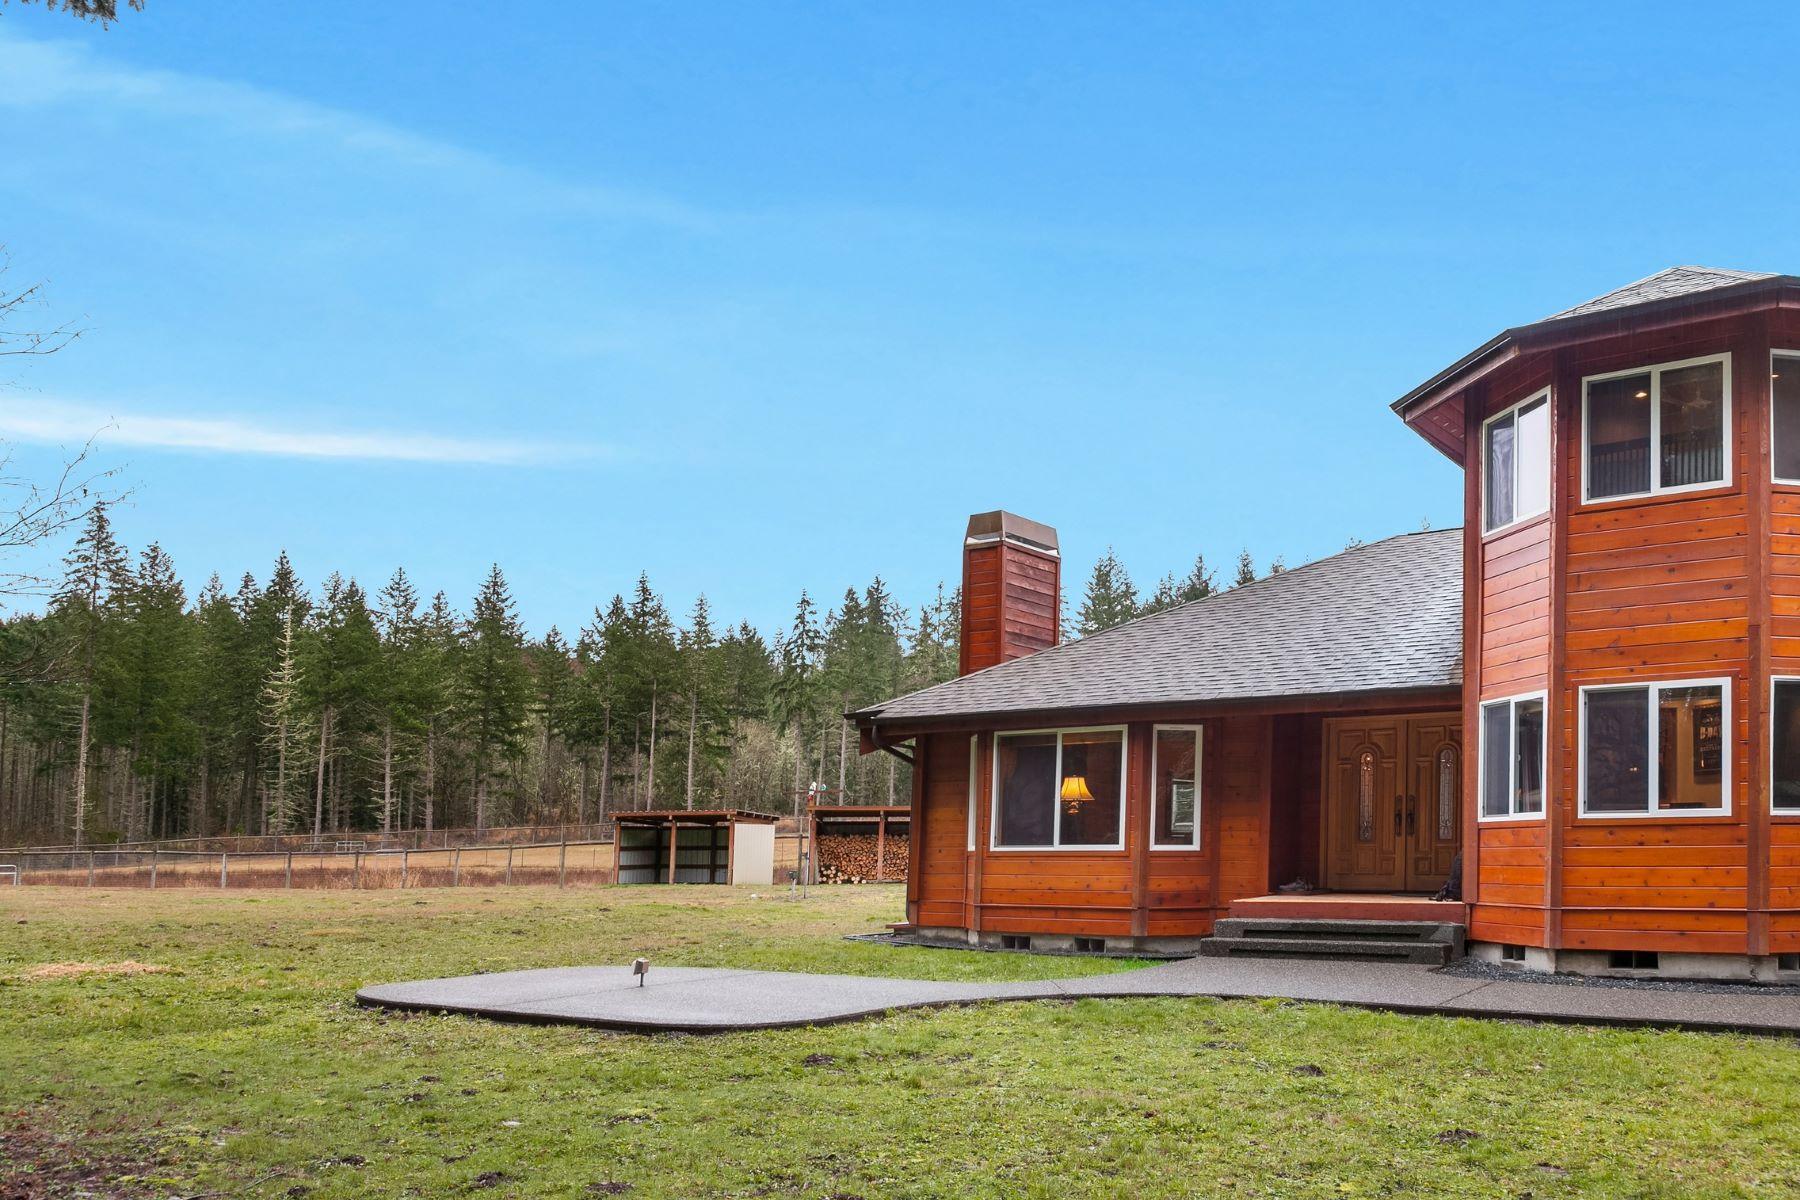 Single Family Homes for Sale at Custom Home - Ridge at Tule Lake 2202 403rd St E Eatonville, Washington 98328 United States